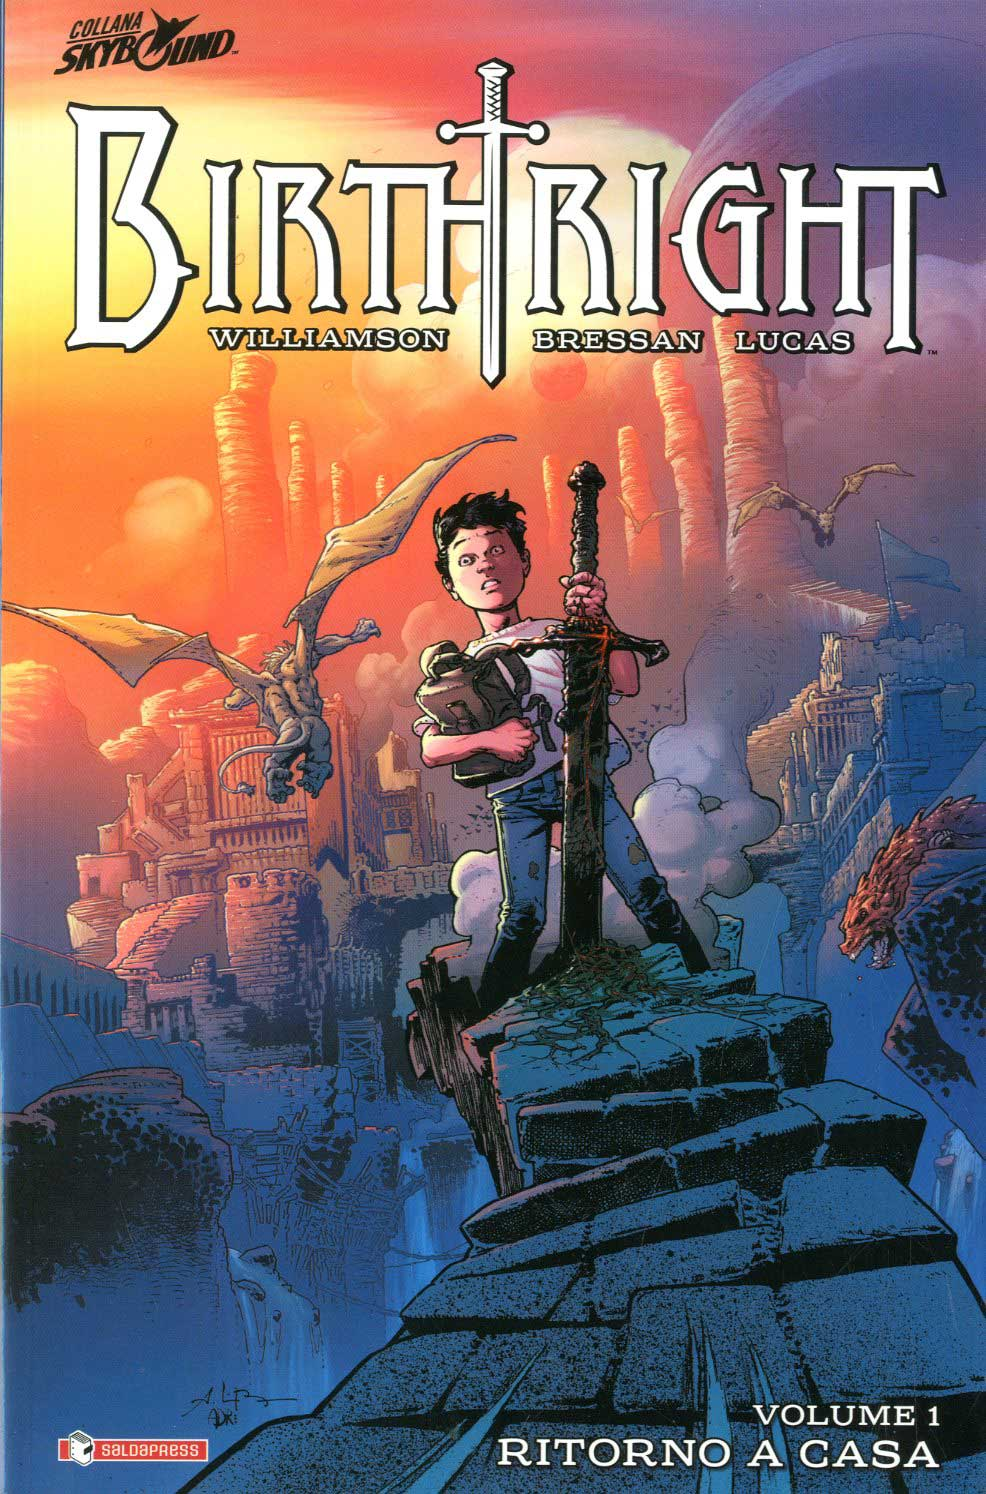 Birthright vol. 1